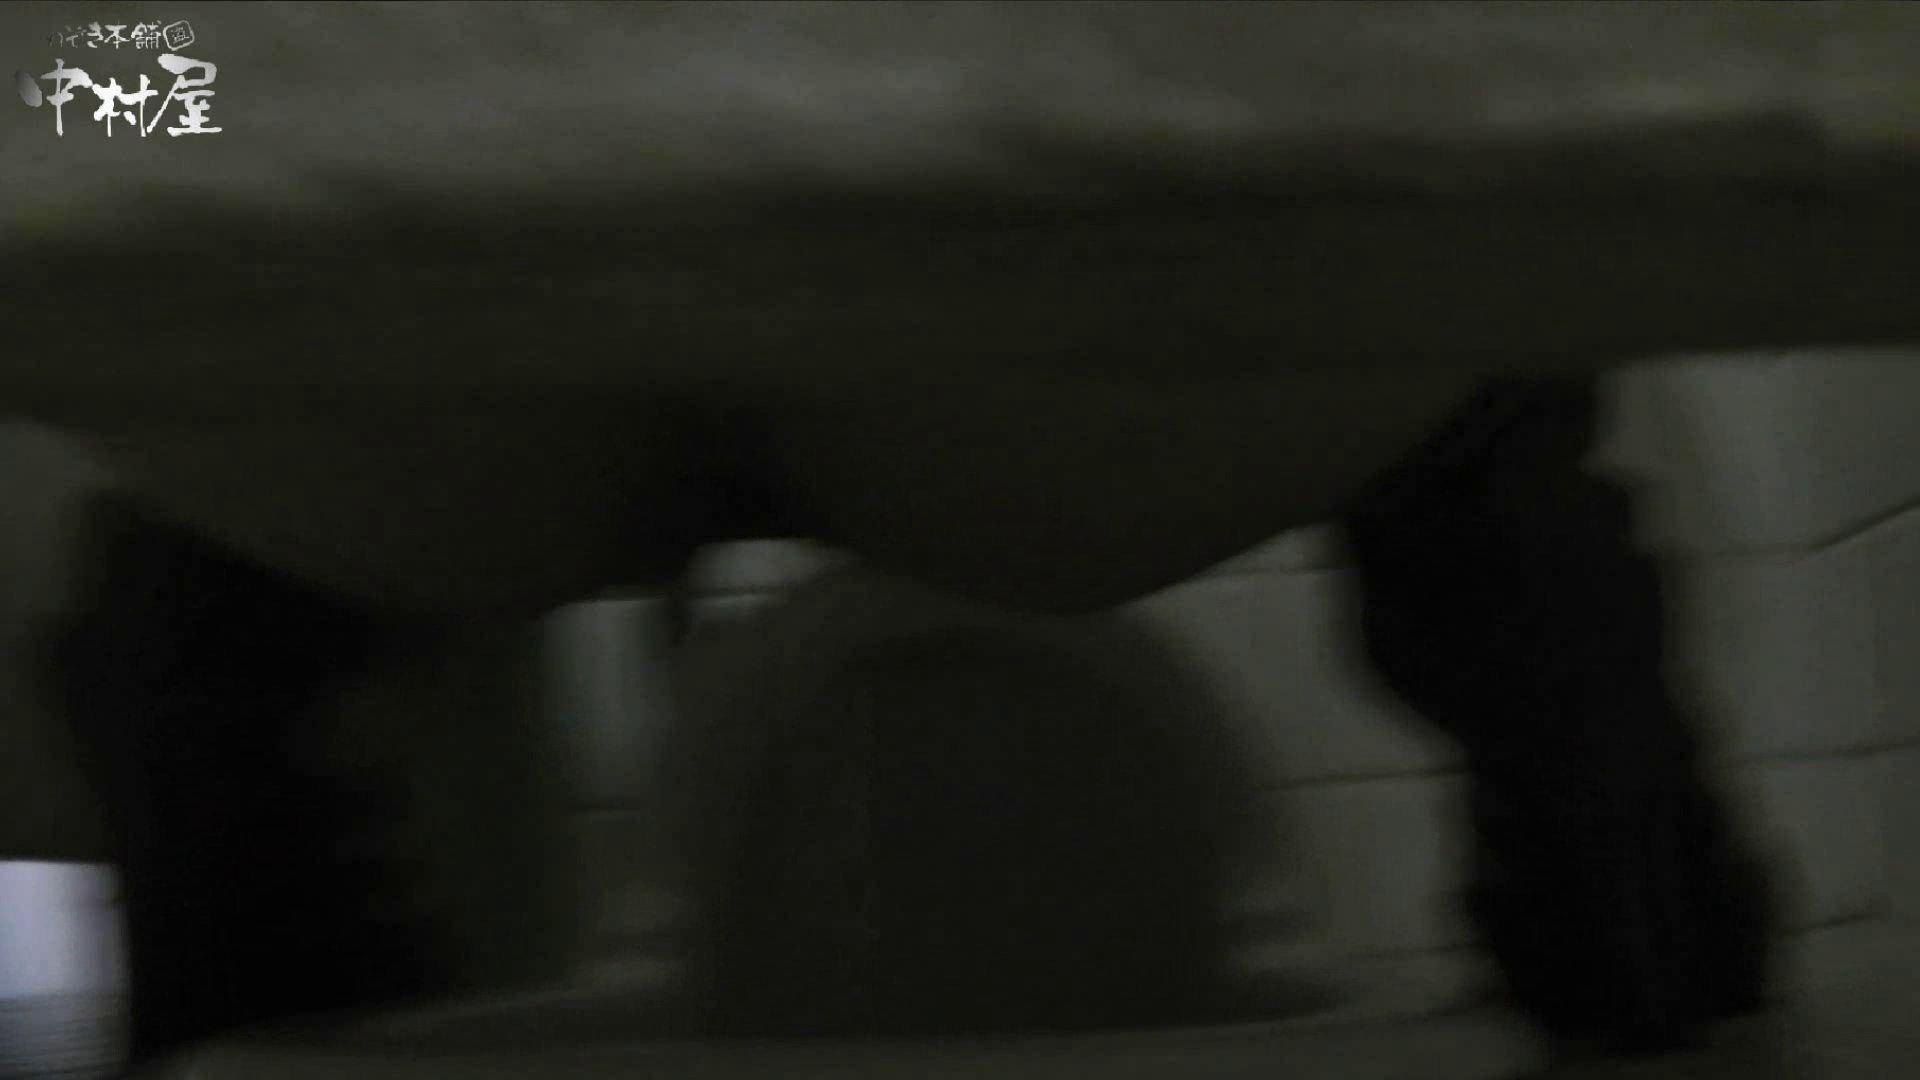 vol.56 命がけ潜伏洗面所! 強力放水清楚ねぃちゃん プライベート ワレメ無修正動画無料 74枚 63